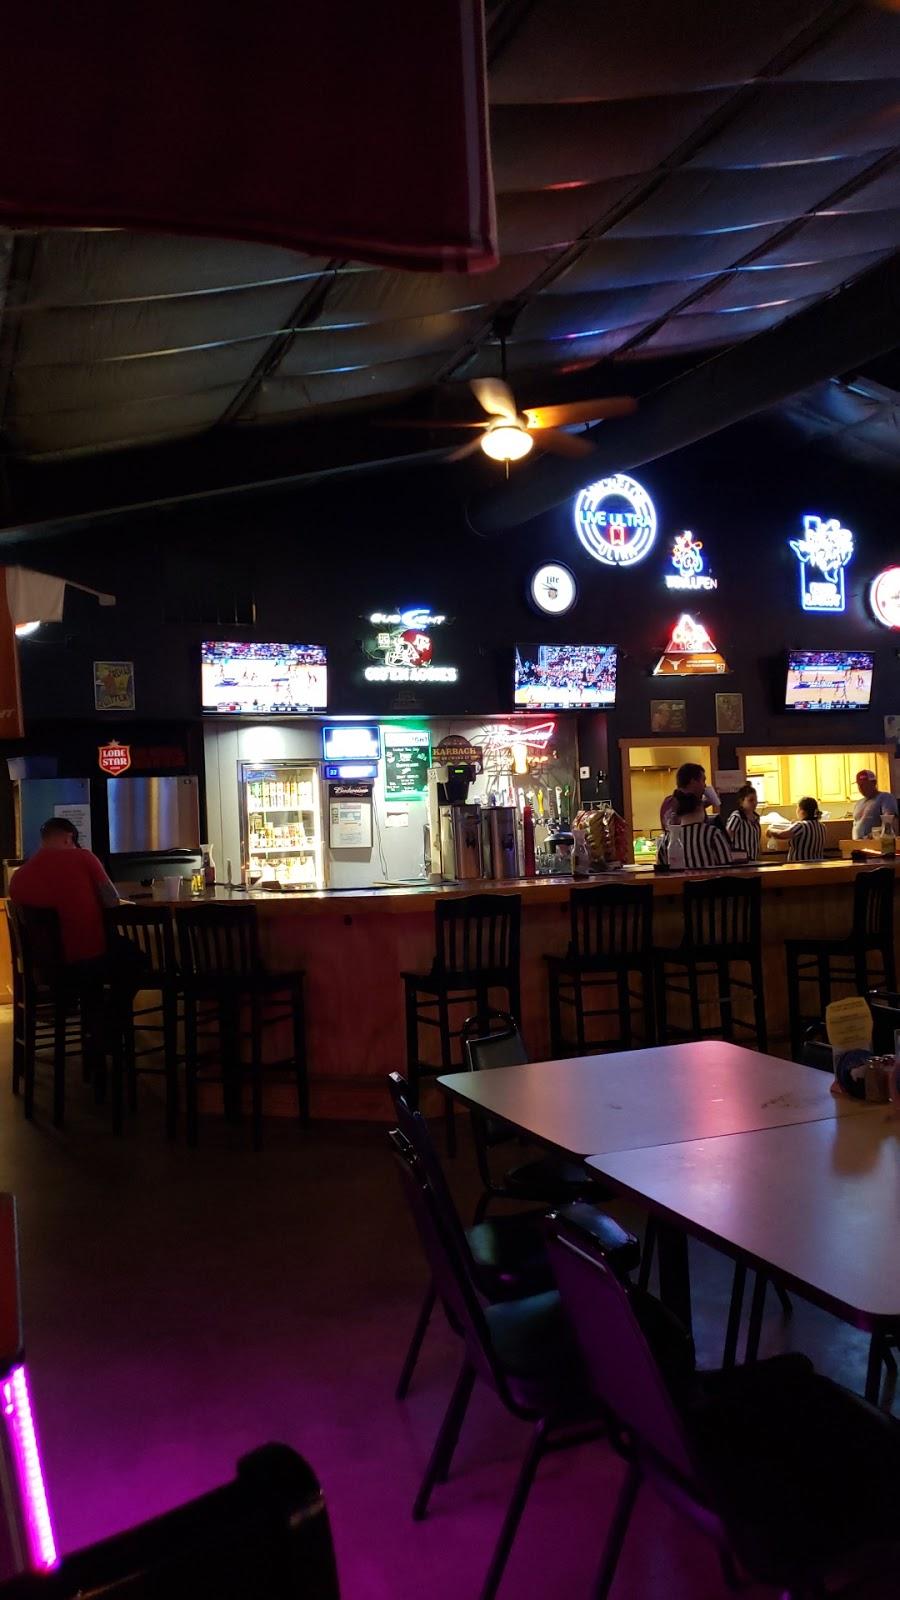 Bullpen Bar & Grill - restaurant  | Photo 7 of 10 | Address: 2156 Co Rd 217, Giddings, TX 78942, USA | Phone: (979) 366-2500